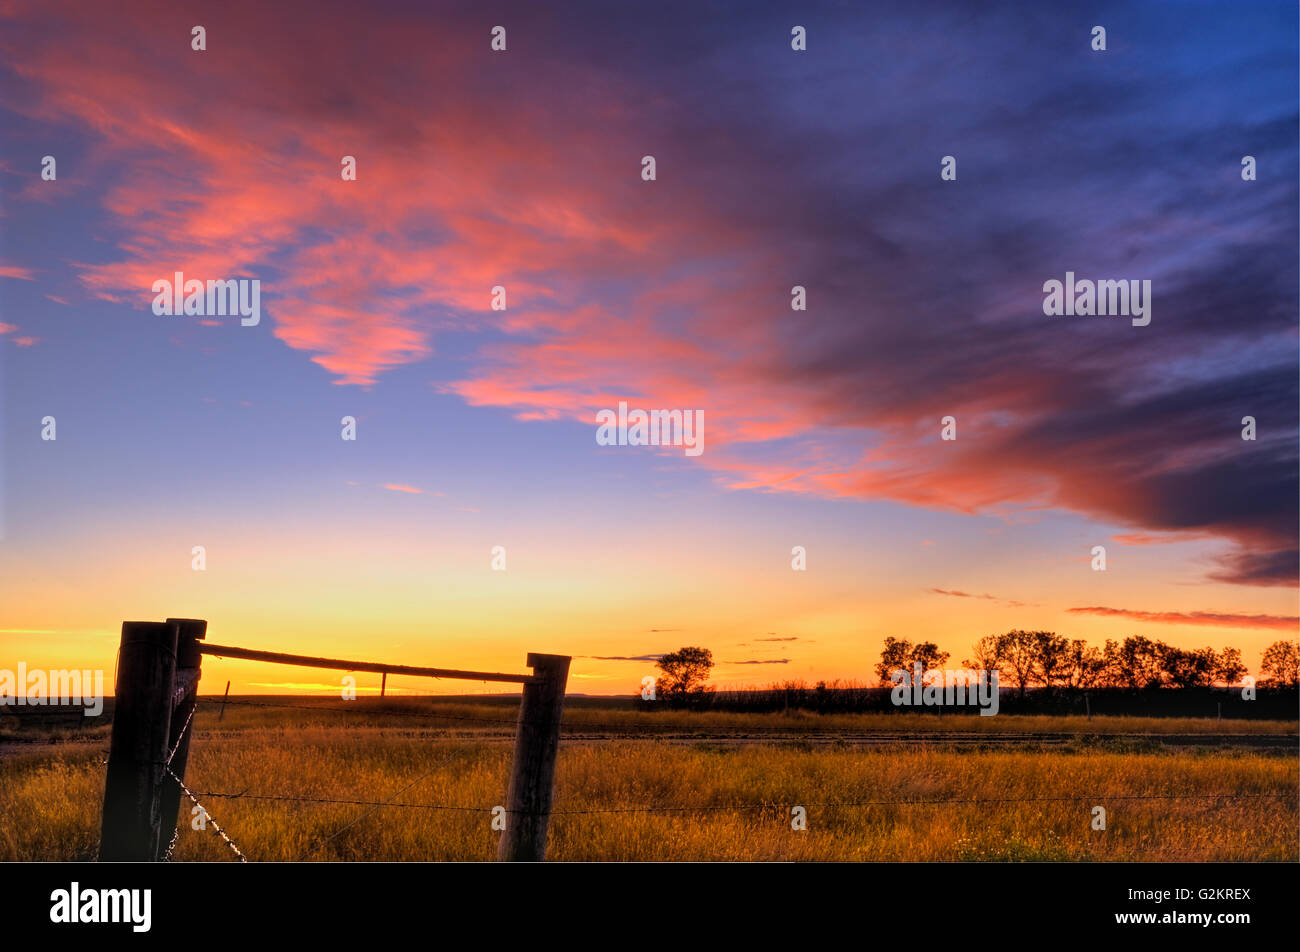 Fence and sunset sky near Braddock Saskatchewan Canada - Stock Image